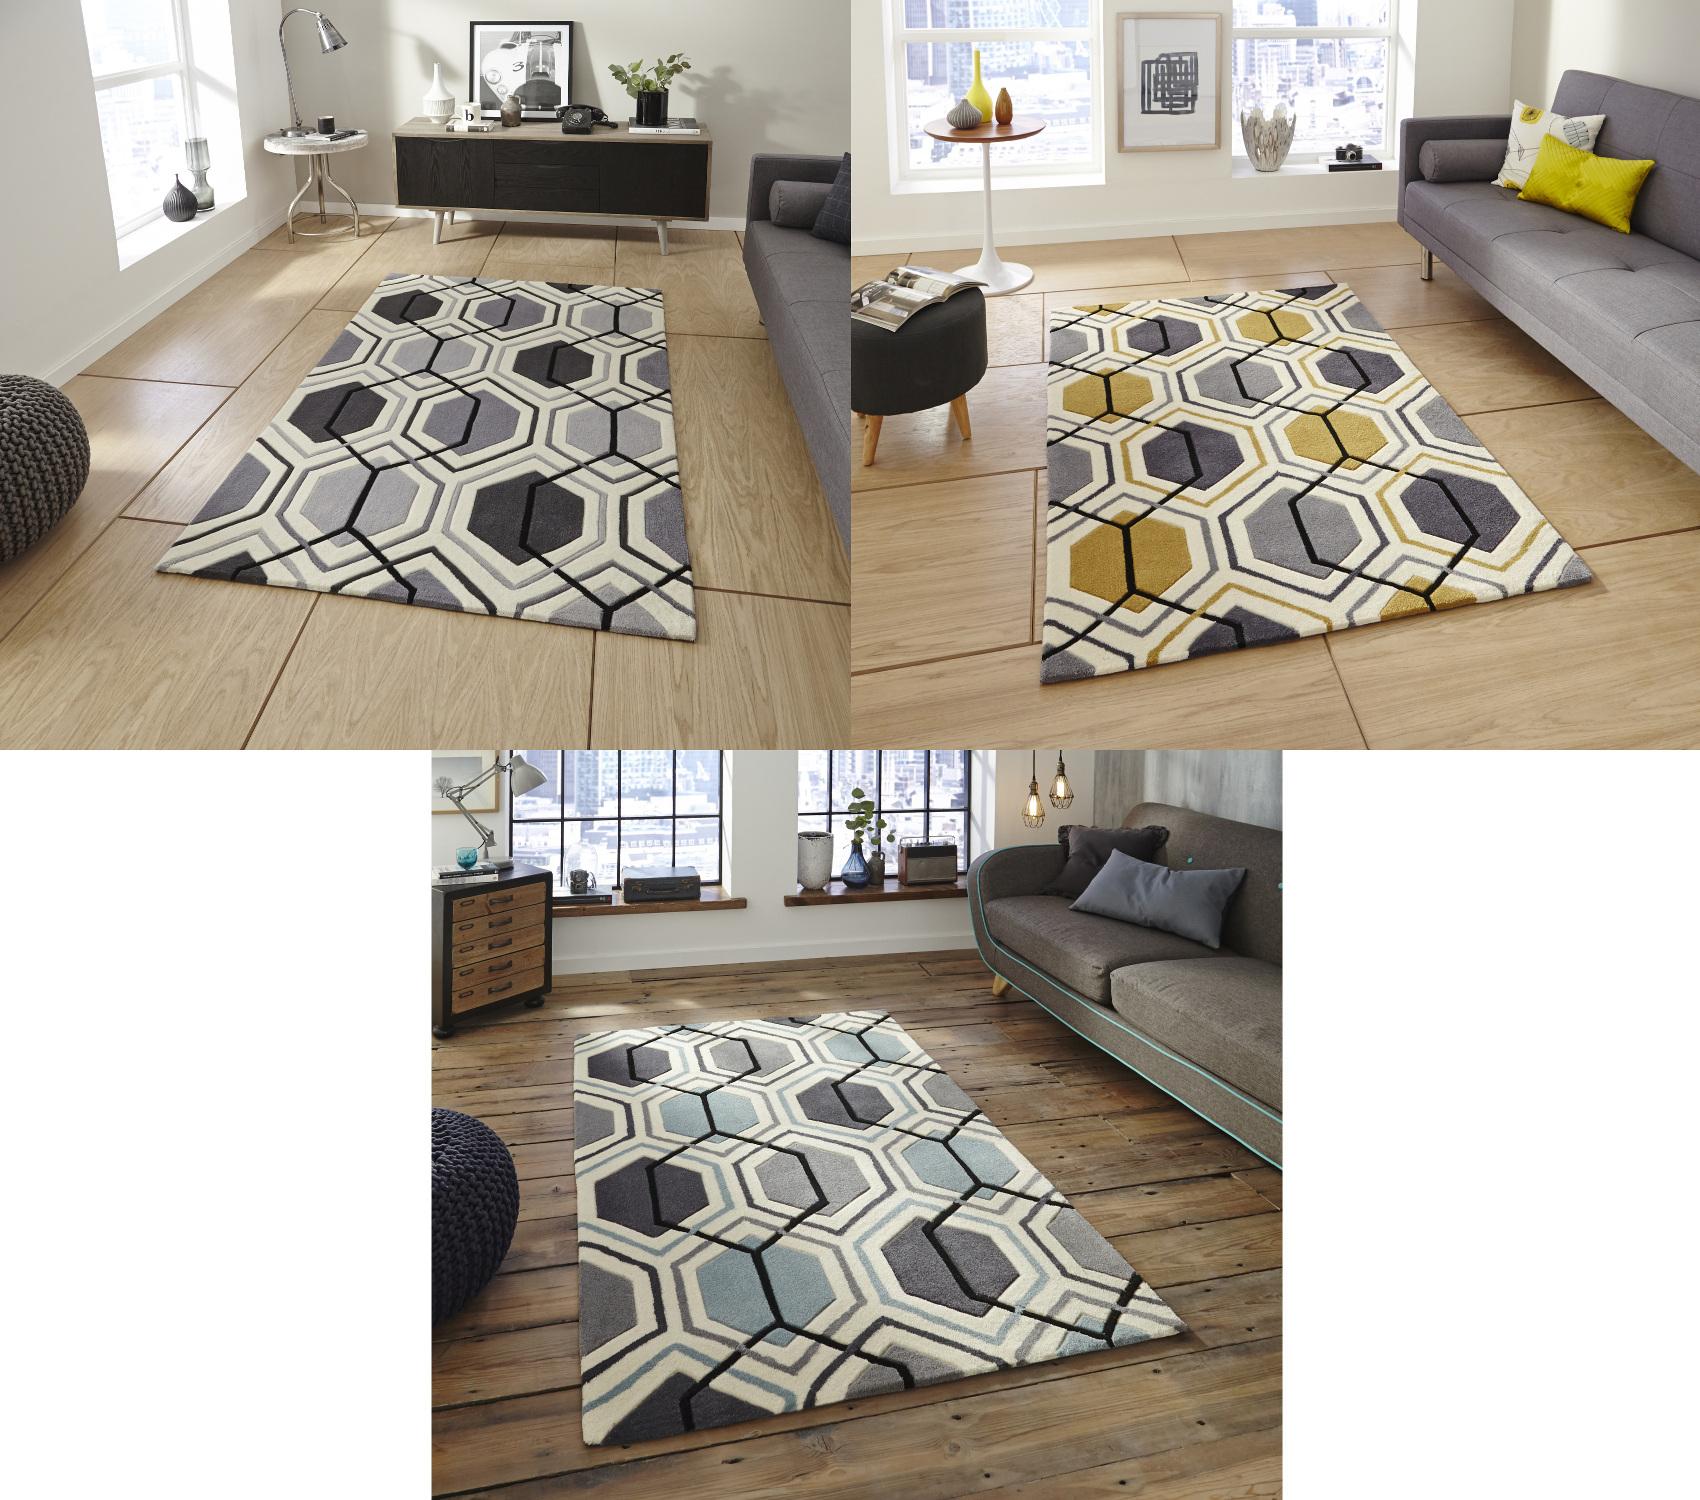 Hong Kong Hexagon Rug 100 Acrylic Hand Tufted Large Geometric Home Decor Mat